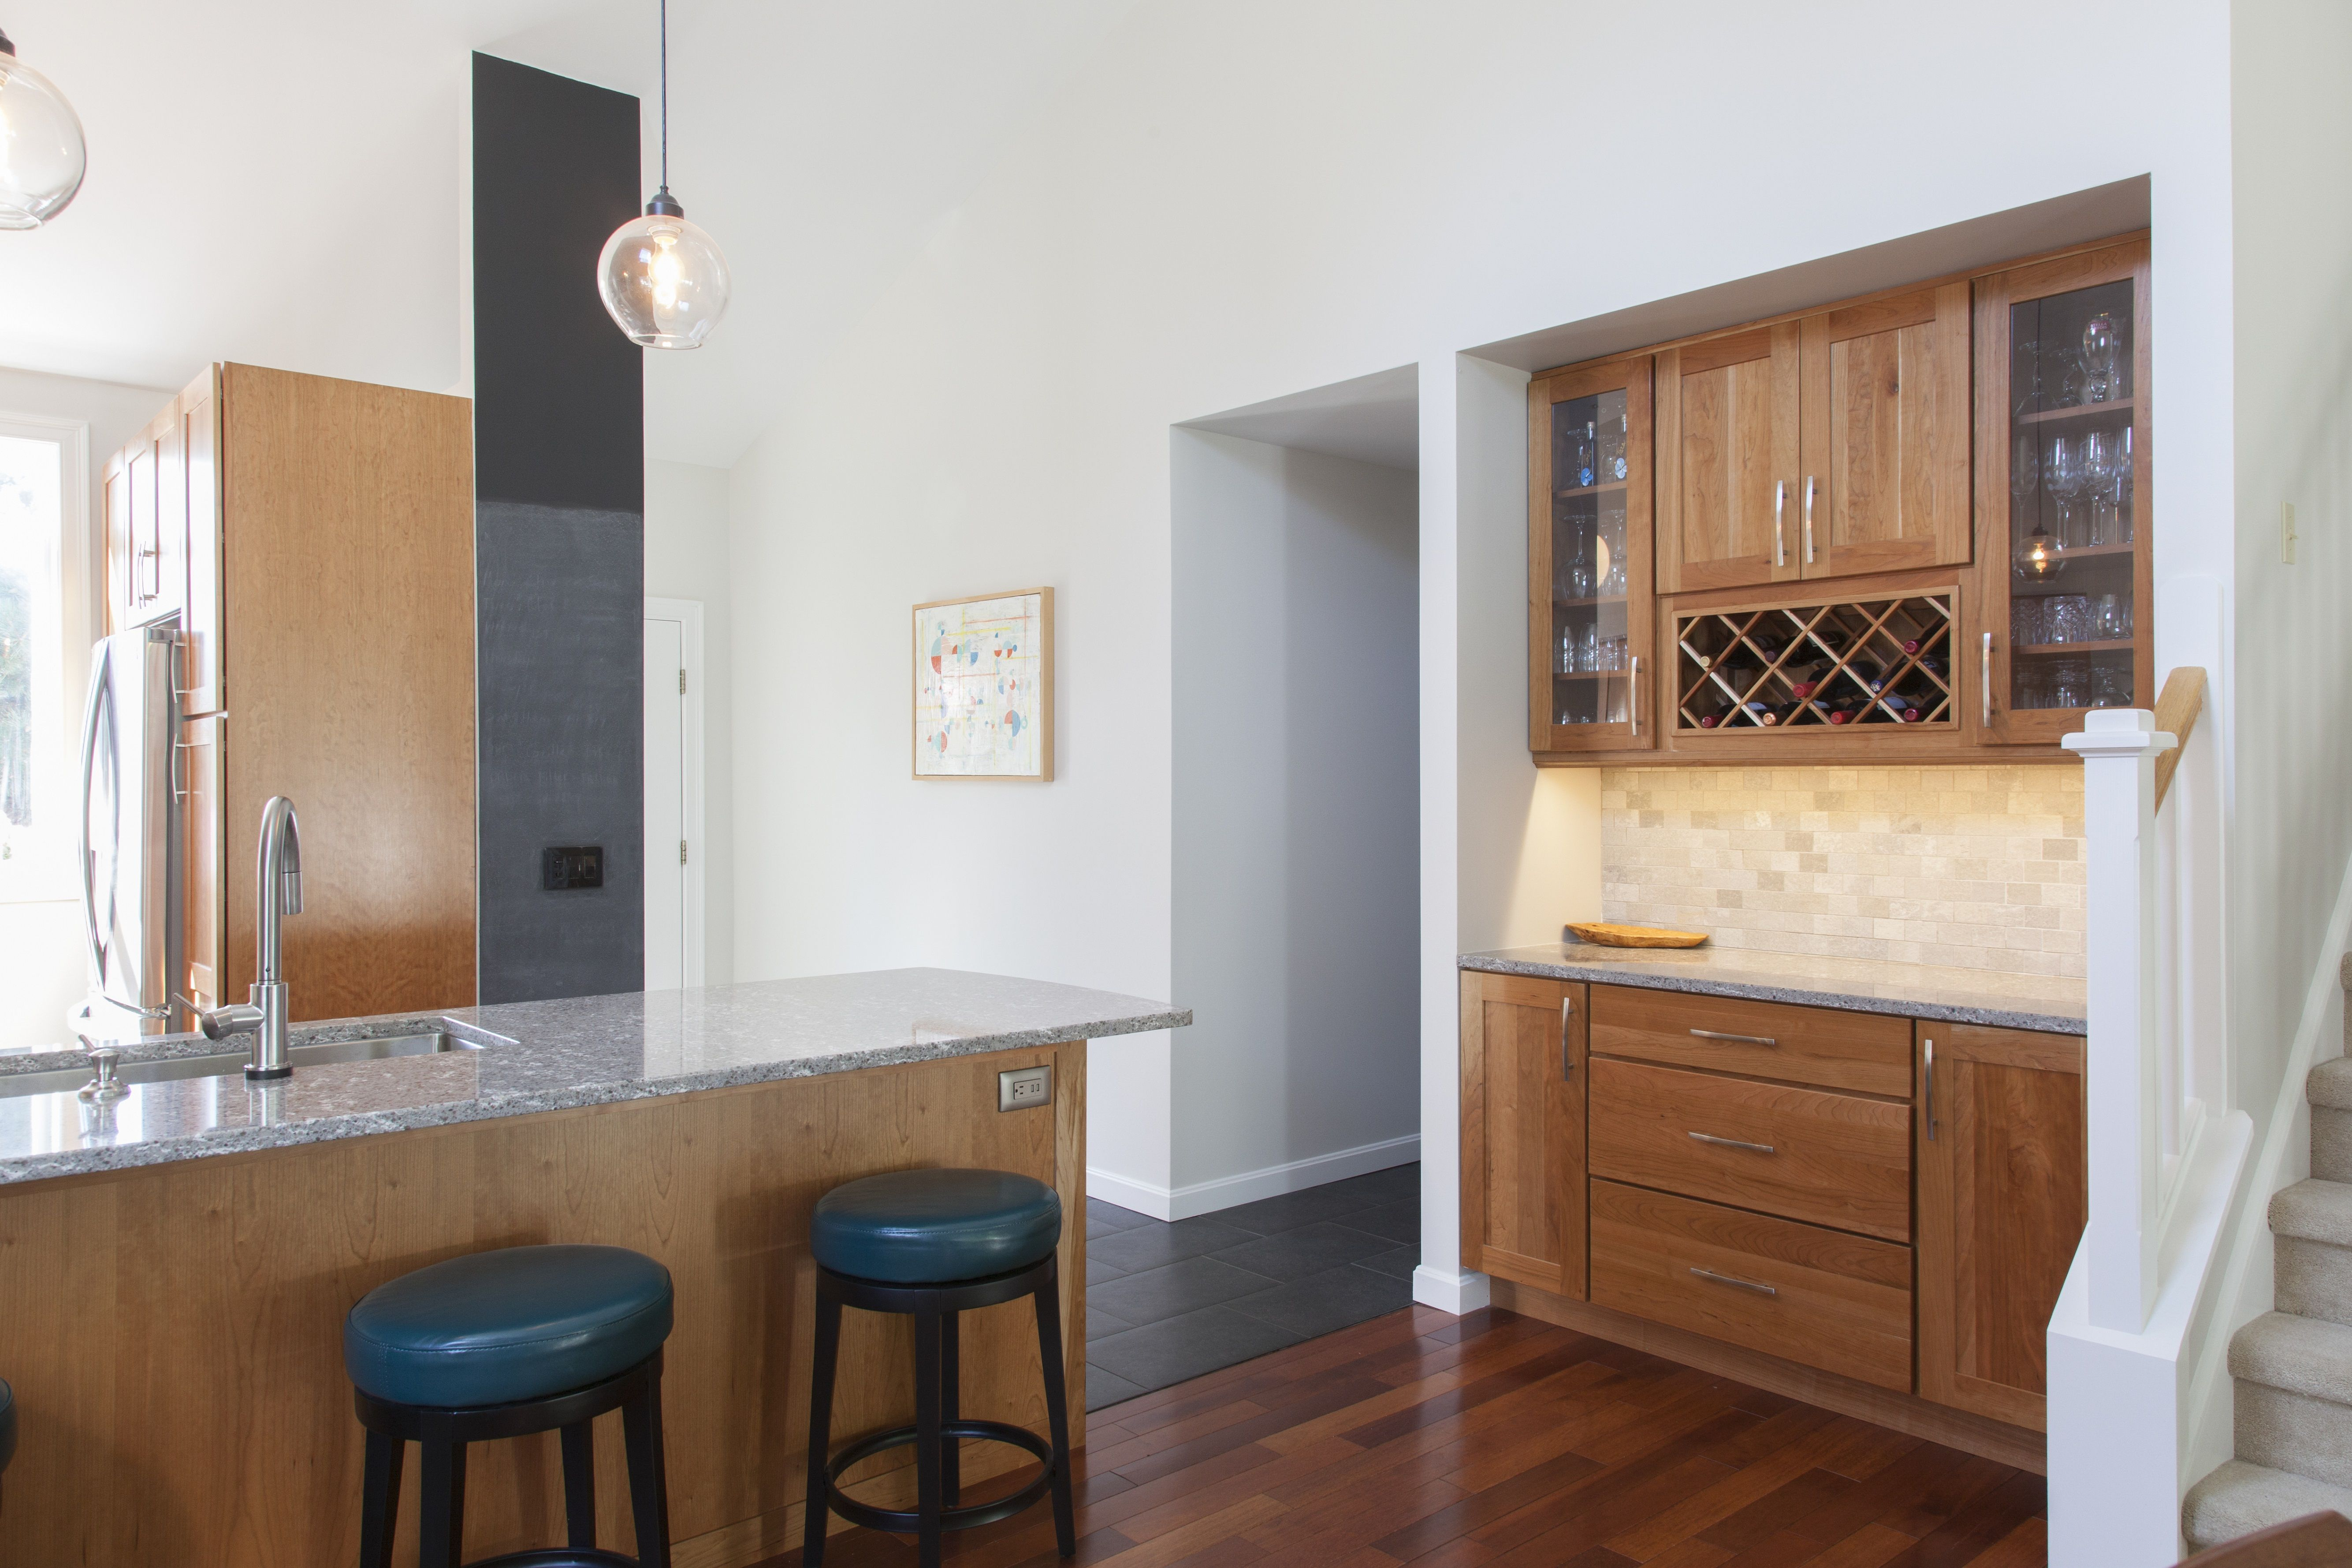 Contemporary kitchen medallion quaint full overlay door with